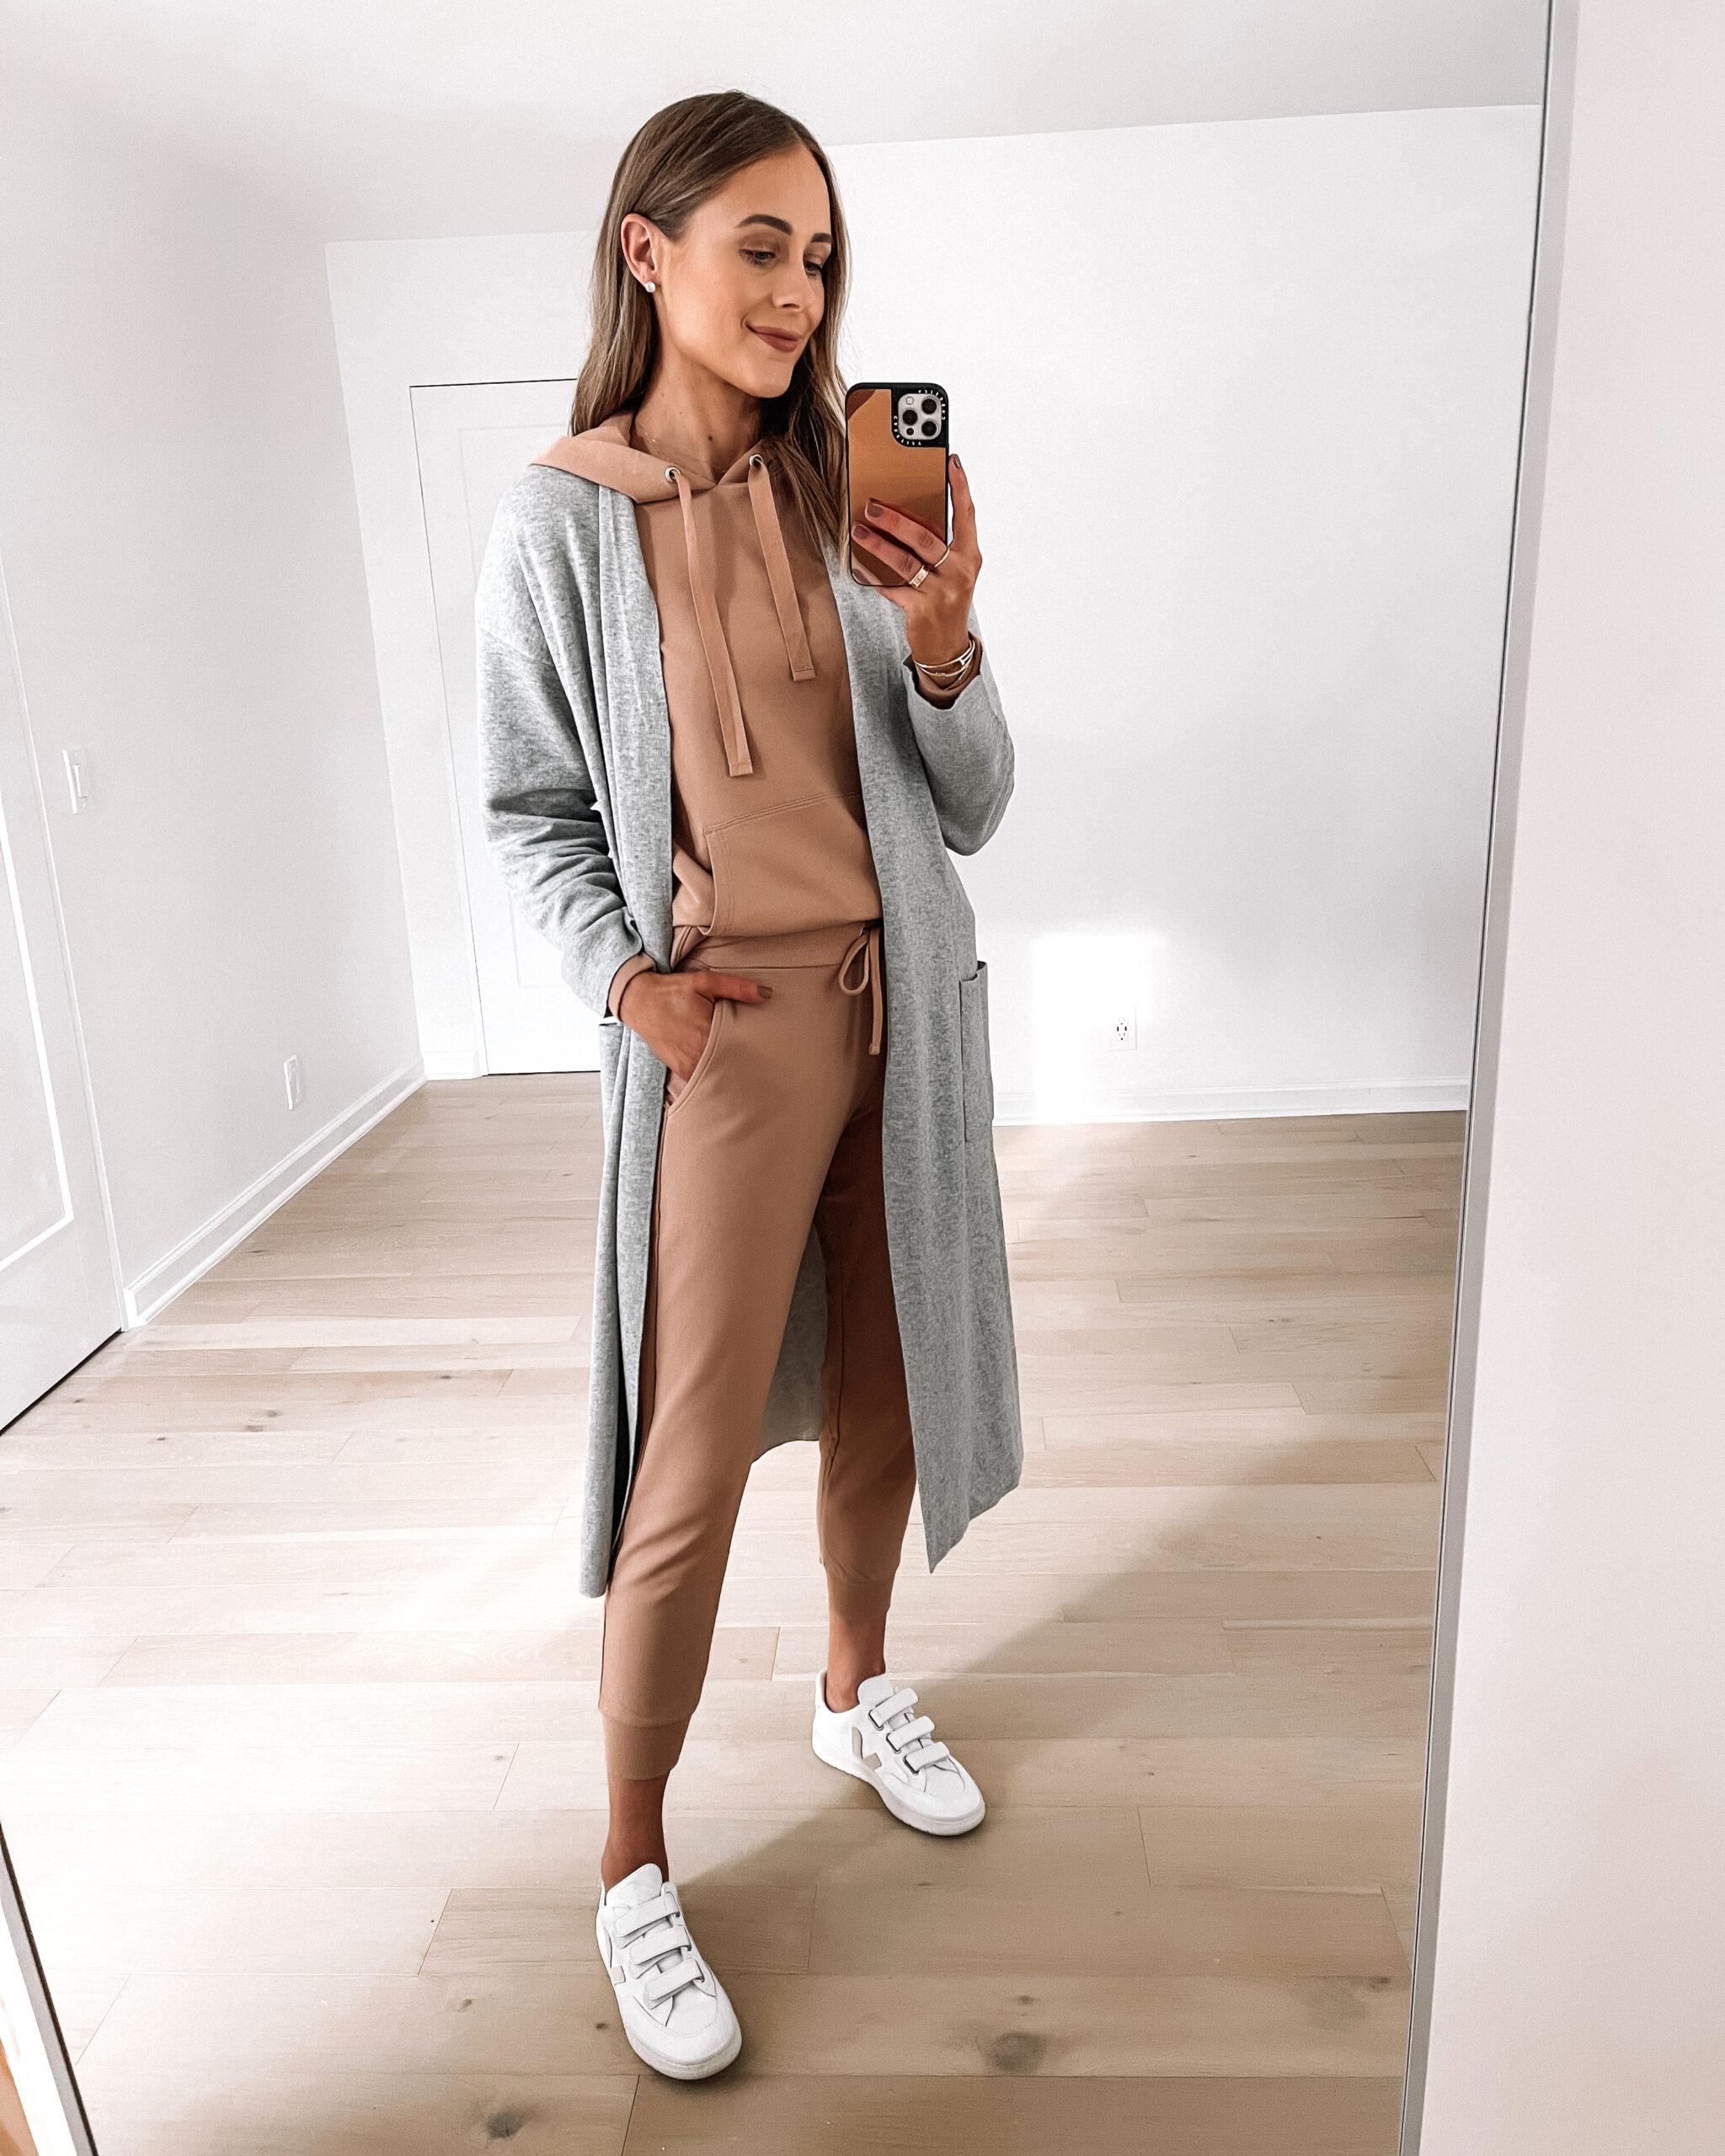 Fashion Jackson Wearing Amazon Fashion Long Grey Cardigan Tan Sweatshirt Tan Joggers White Veja Sneakers Outfit